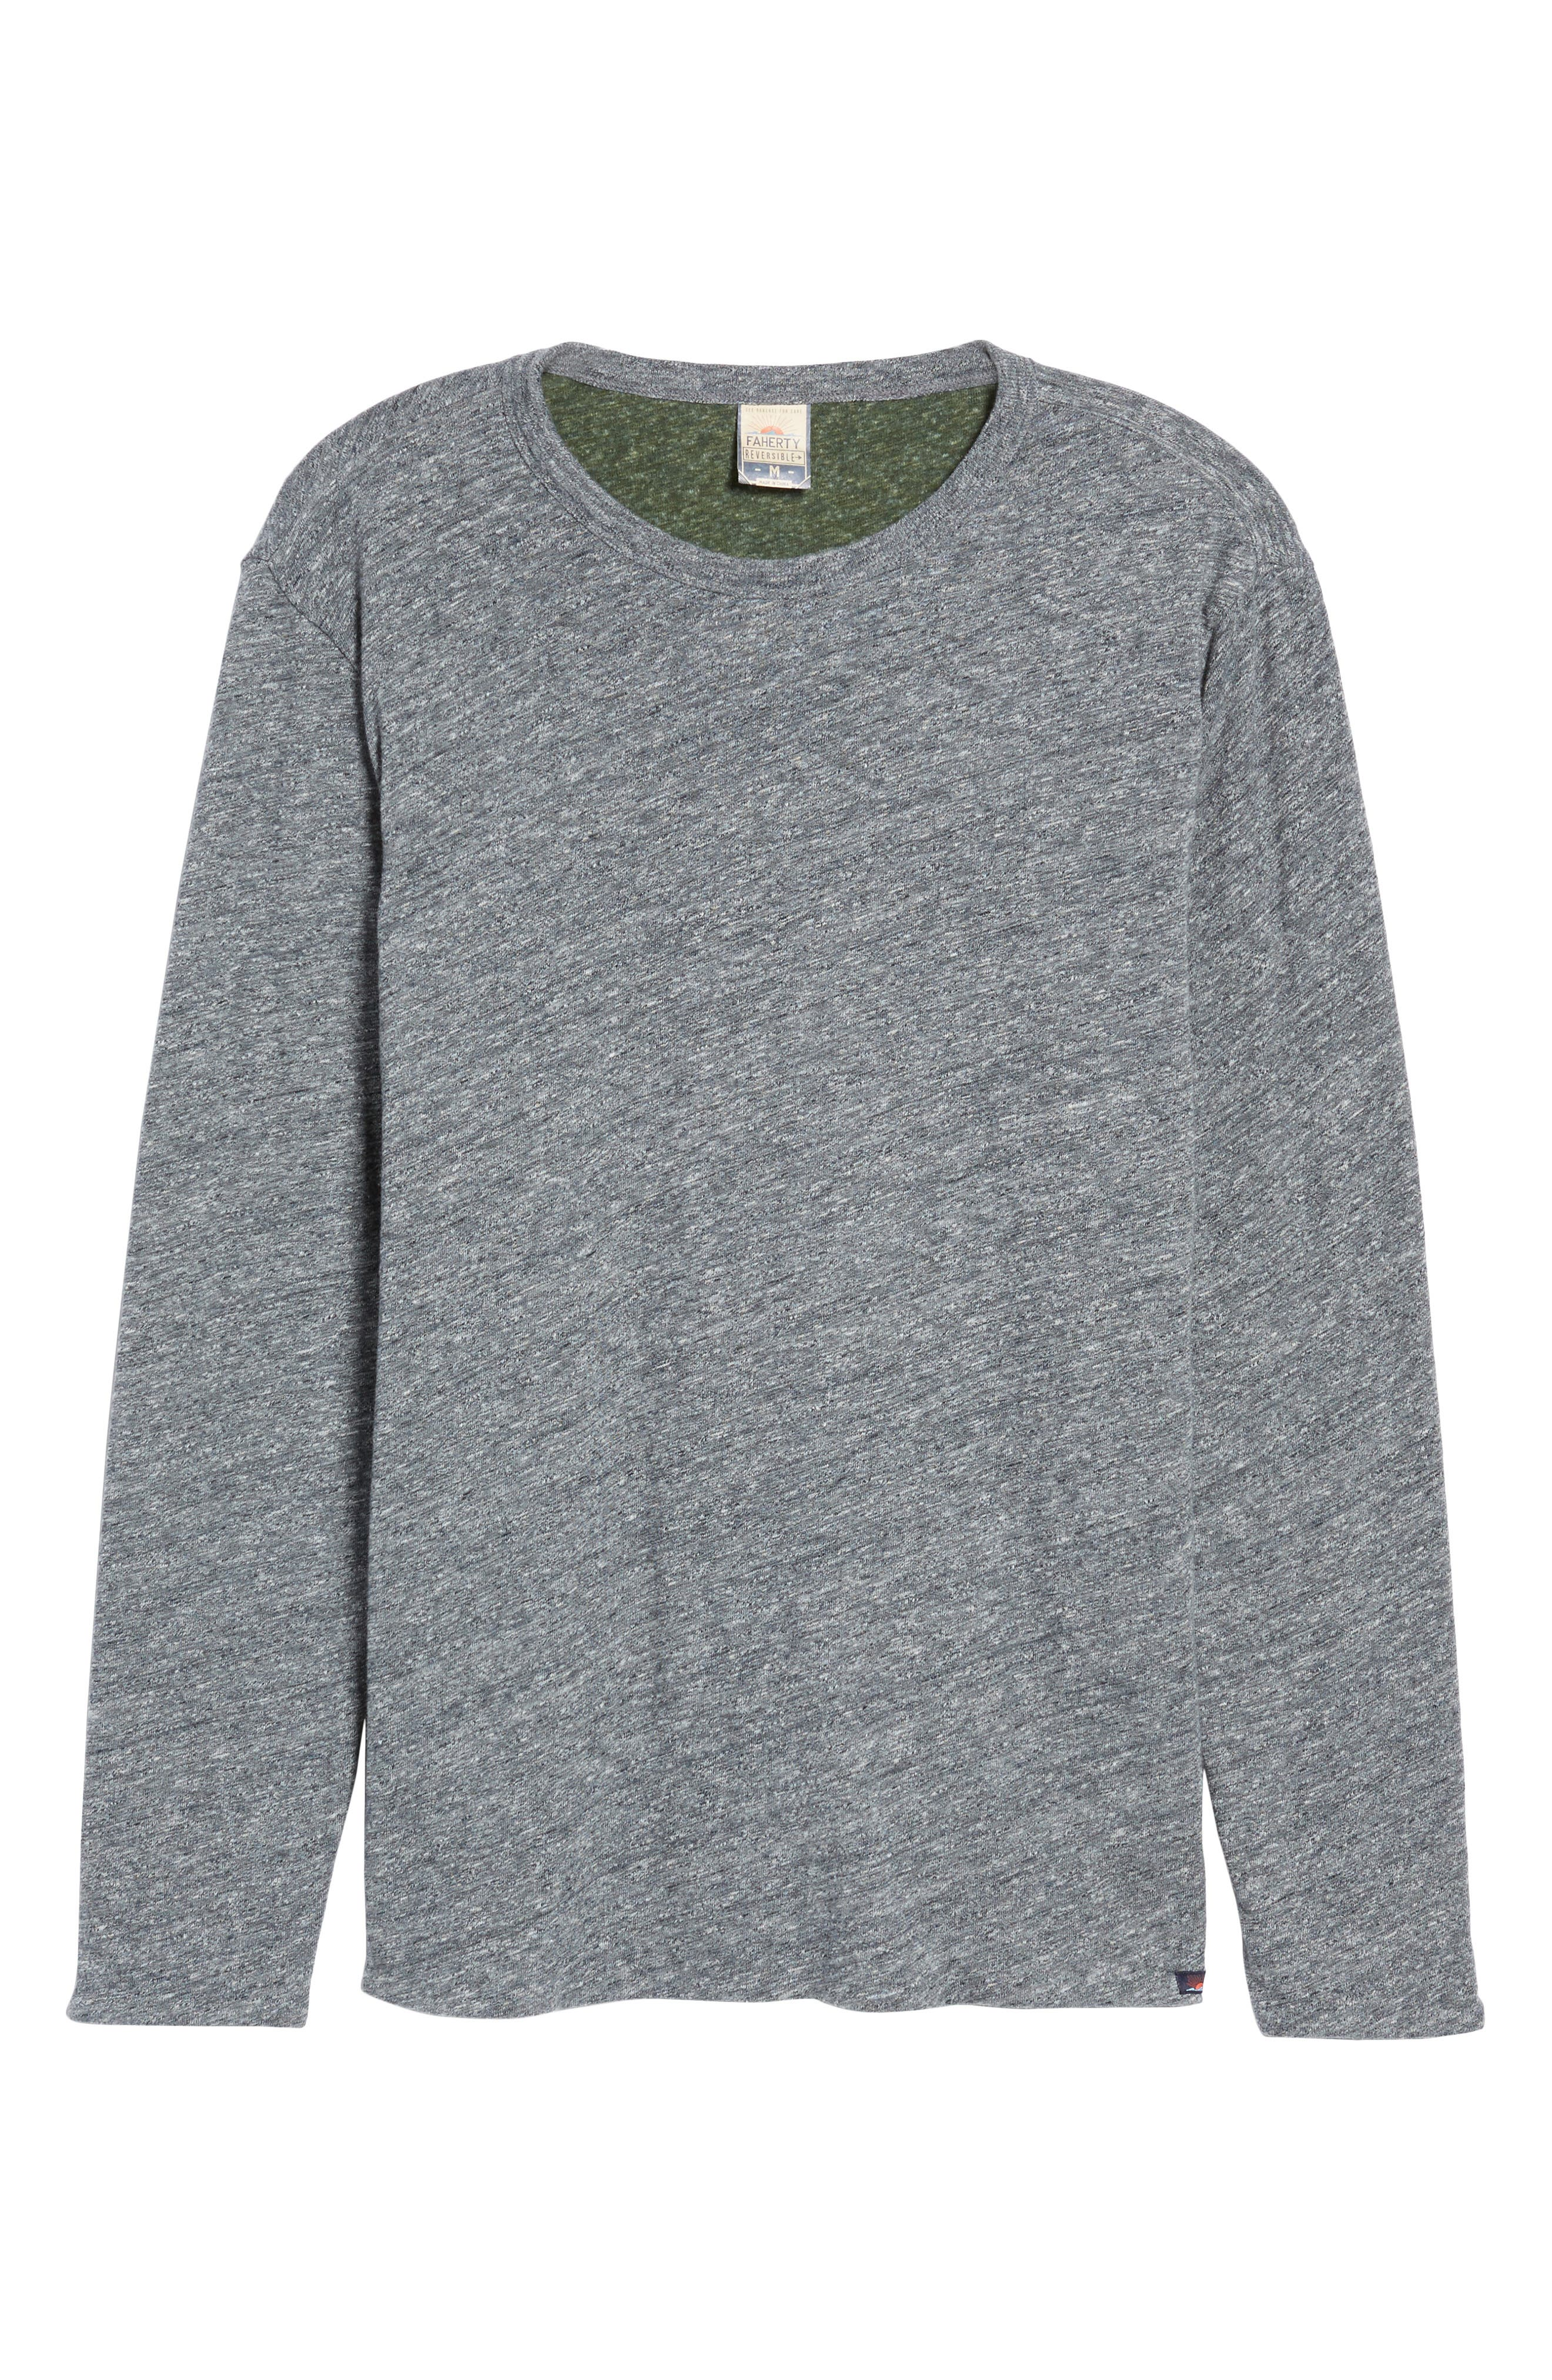 Reversible Long Sleeve Crewneck T-Shirt,                             Alternate thumbnail 6, color,                             038